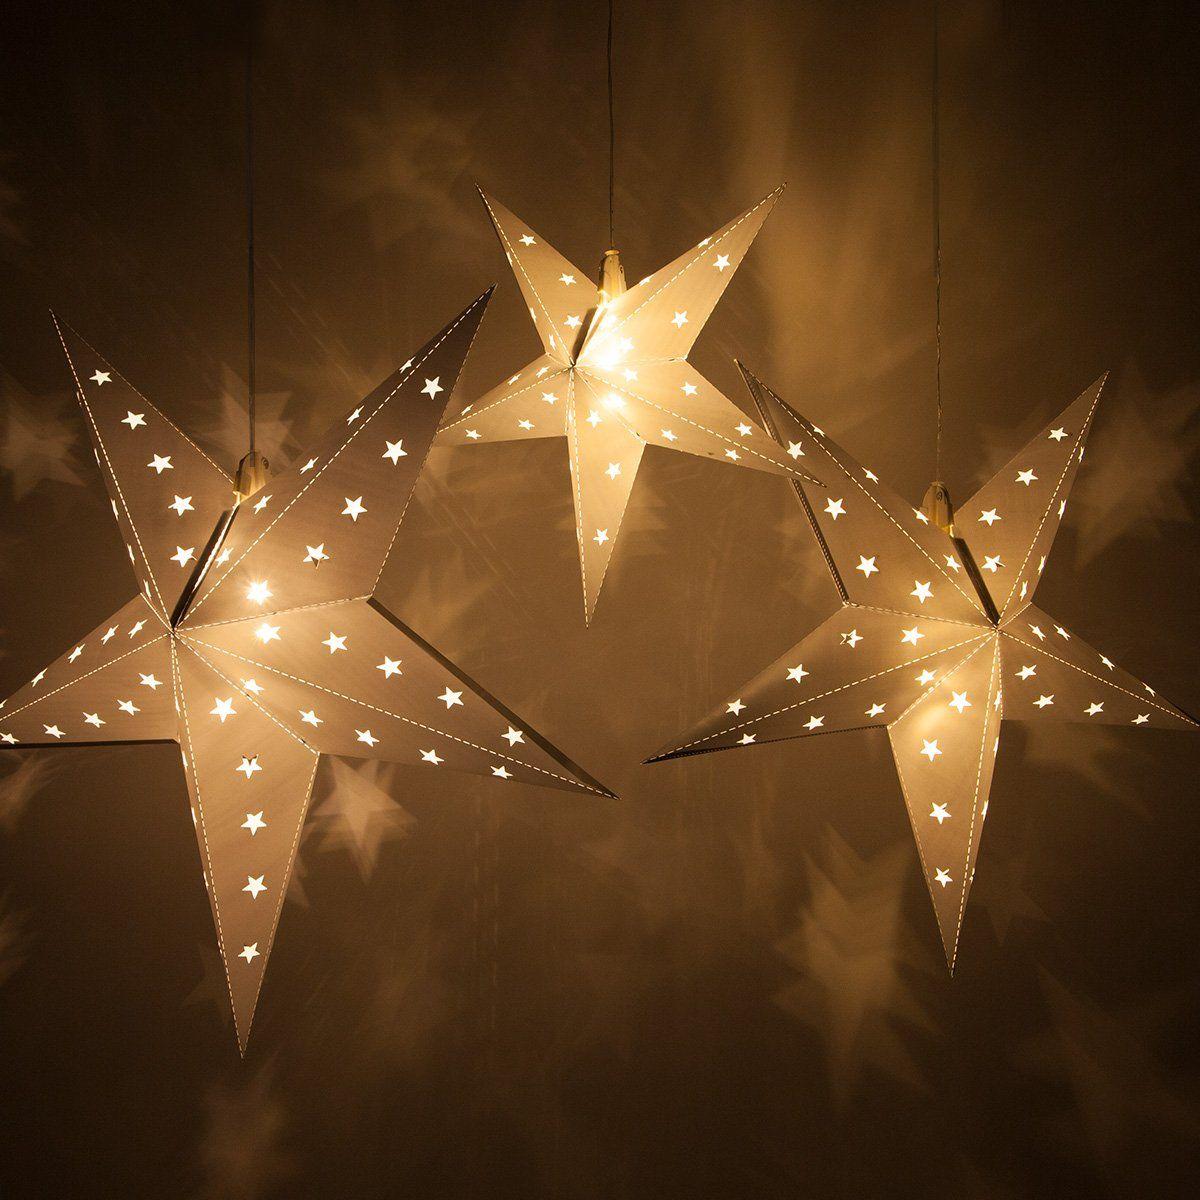 Foldflat 5point Star Light Led Star Christmas Decoration Christmas Star Light Batterypowered With Timer 18 Silver Lights Lanterns Battery Powered Led Lights